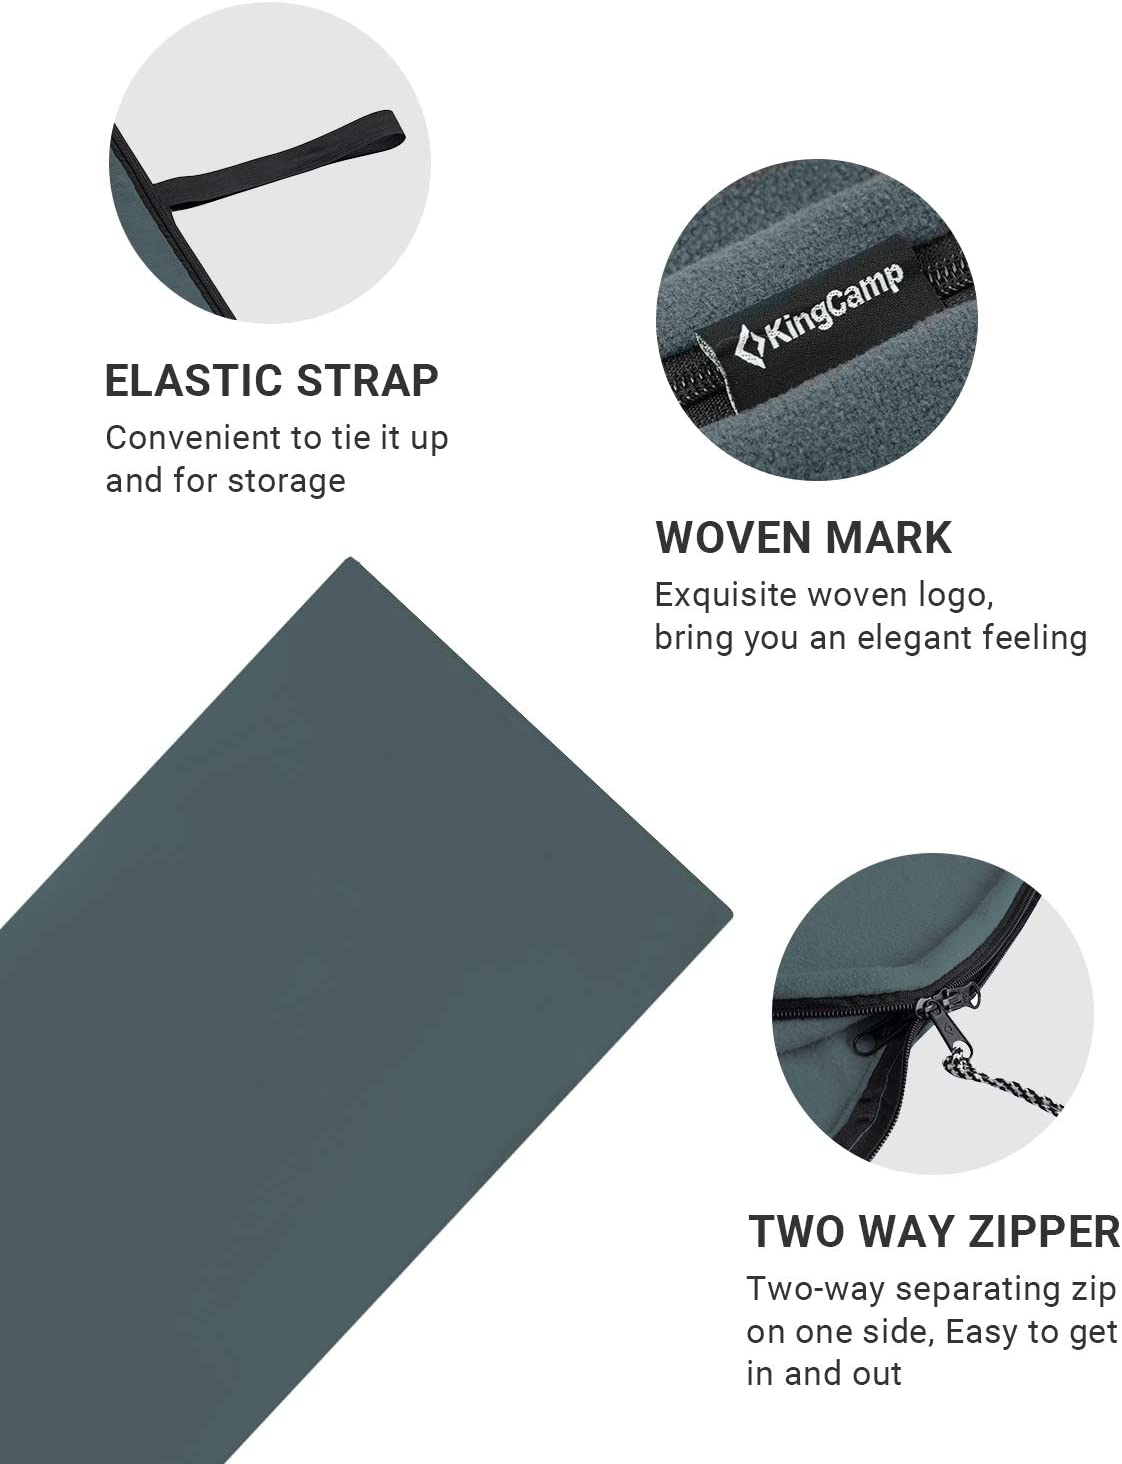 KingCamp Lightweight Spring Fleece Blanket Multifunctional Sleeping Bag Liner For Camping Hiking Festivals 180 X 150cm